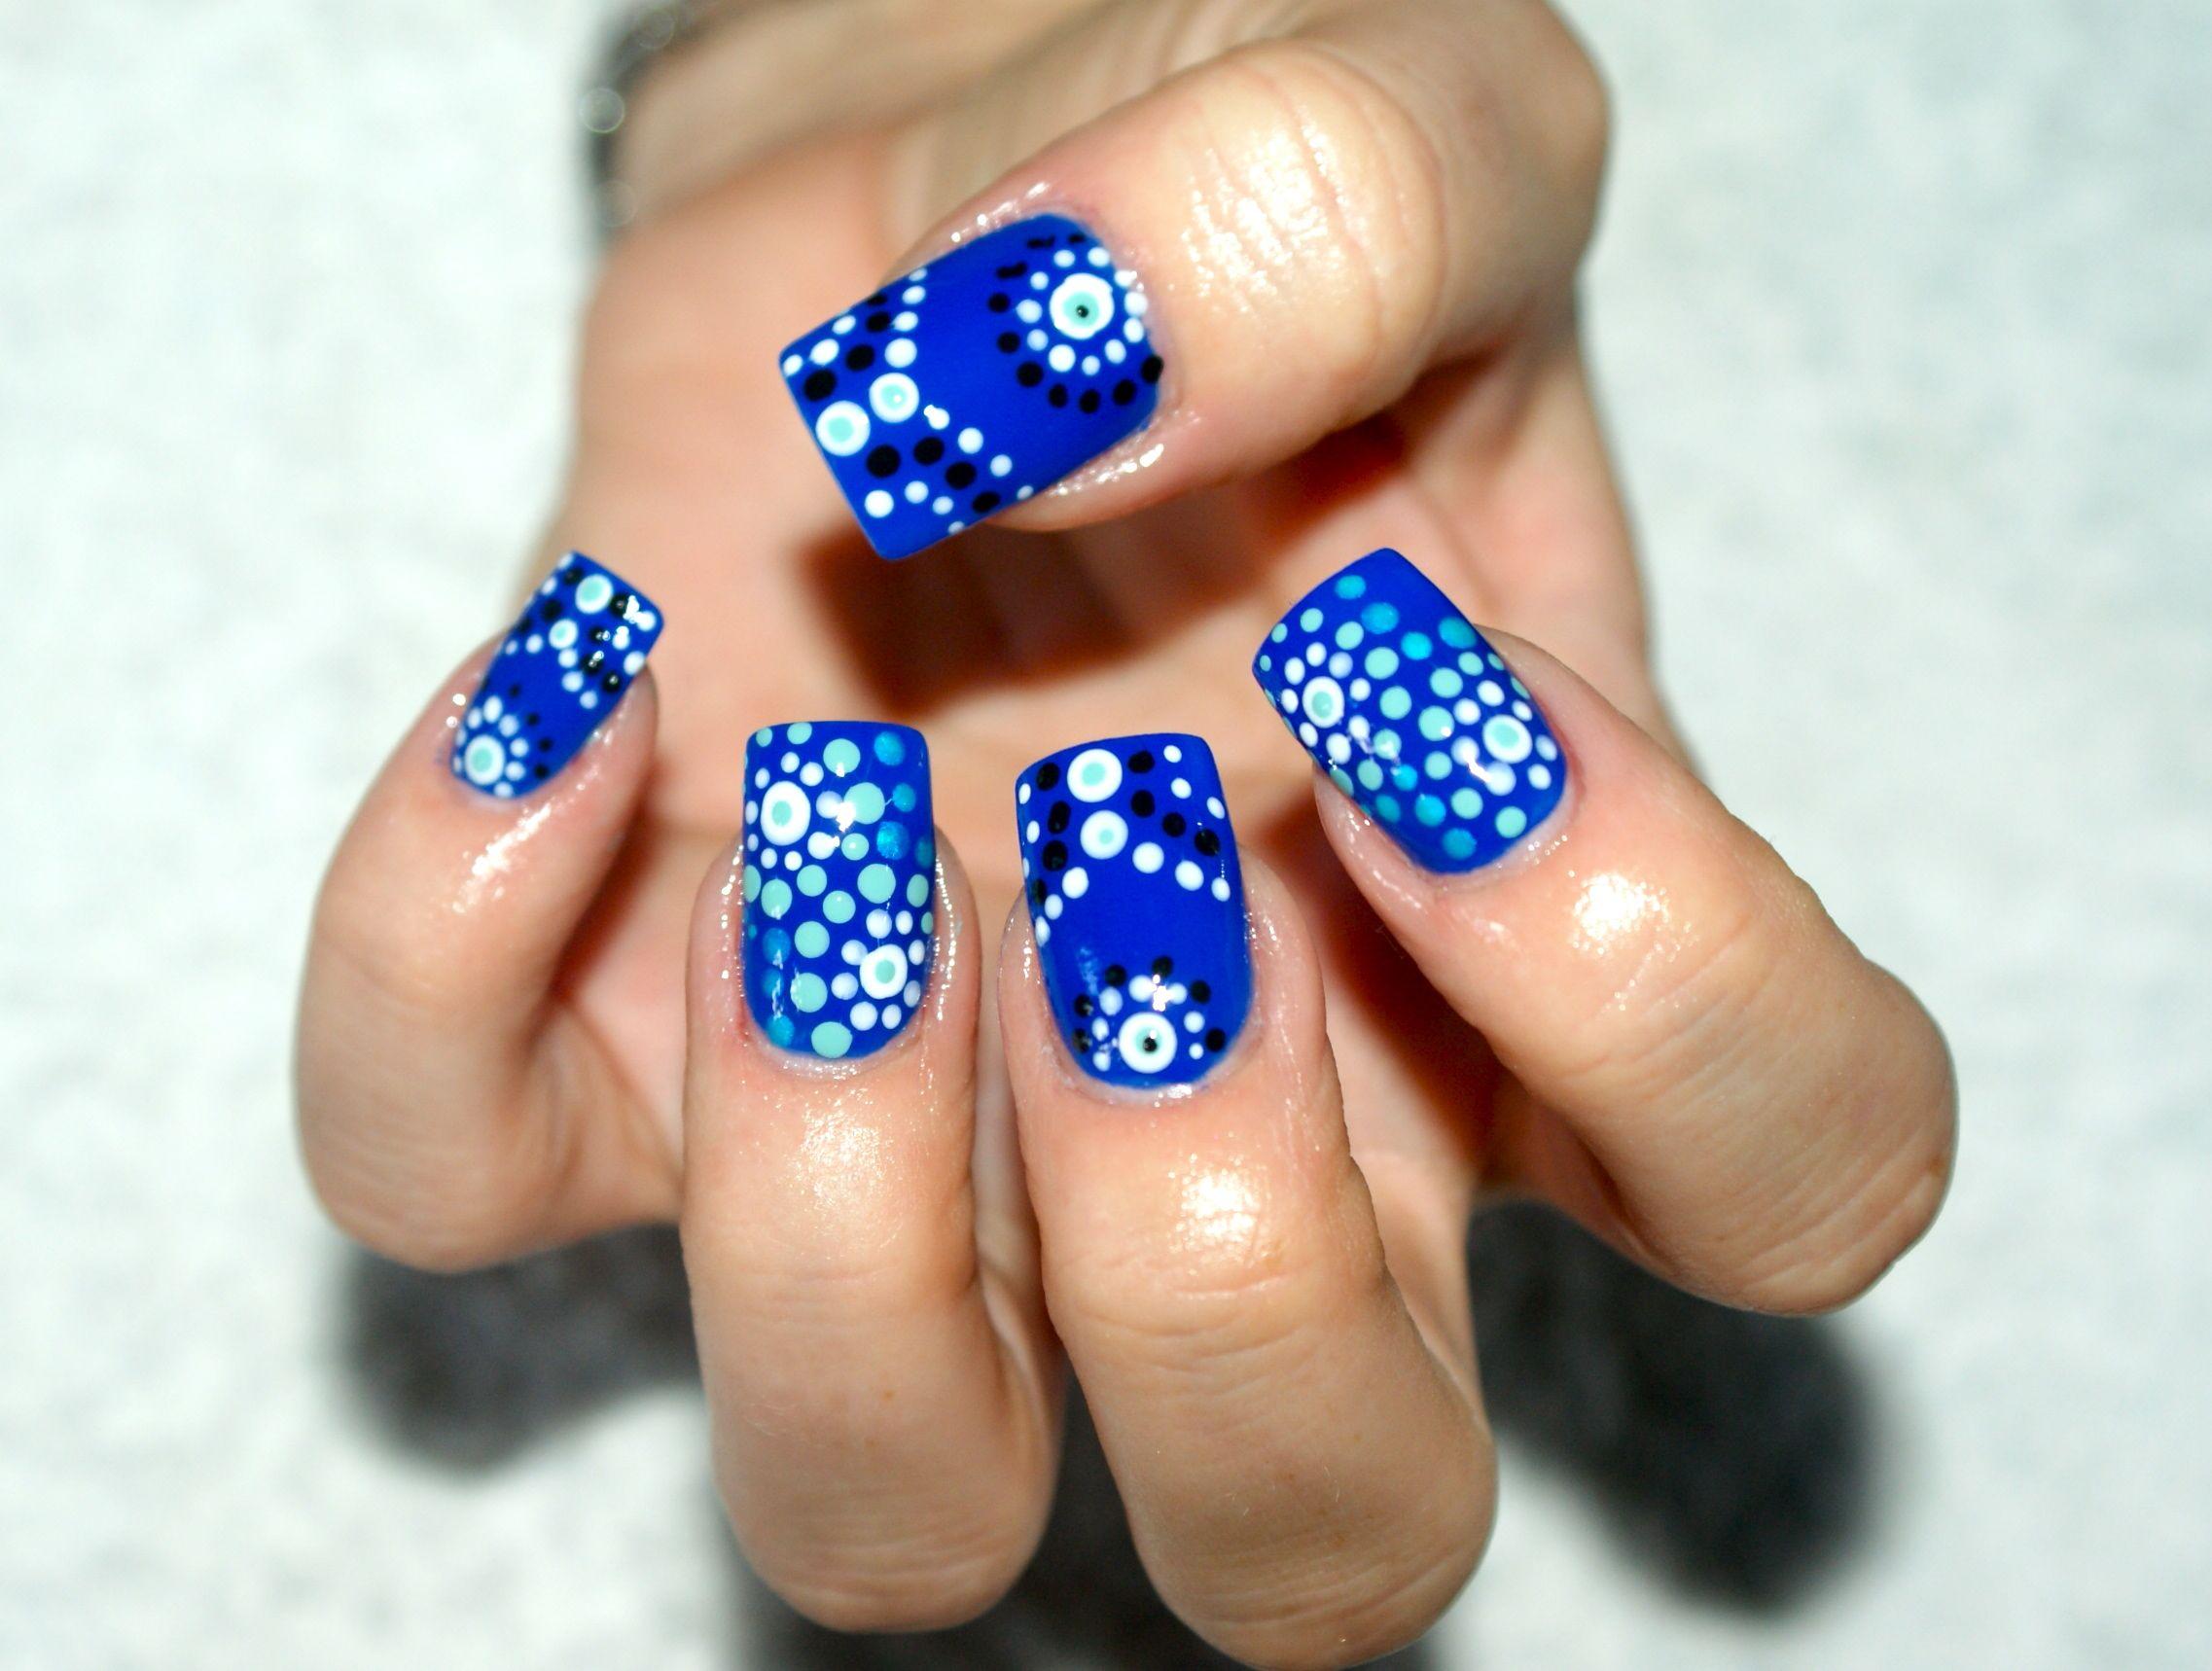 Pinkys nails by michaela nails beauty